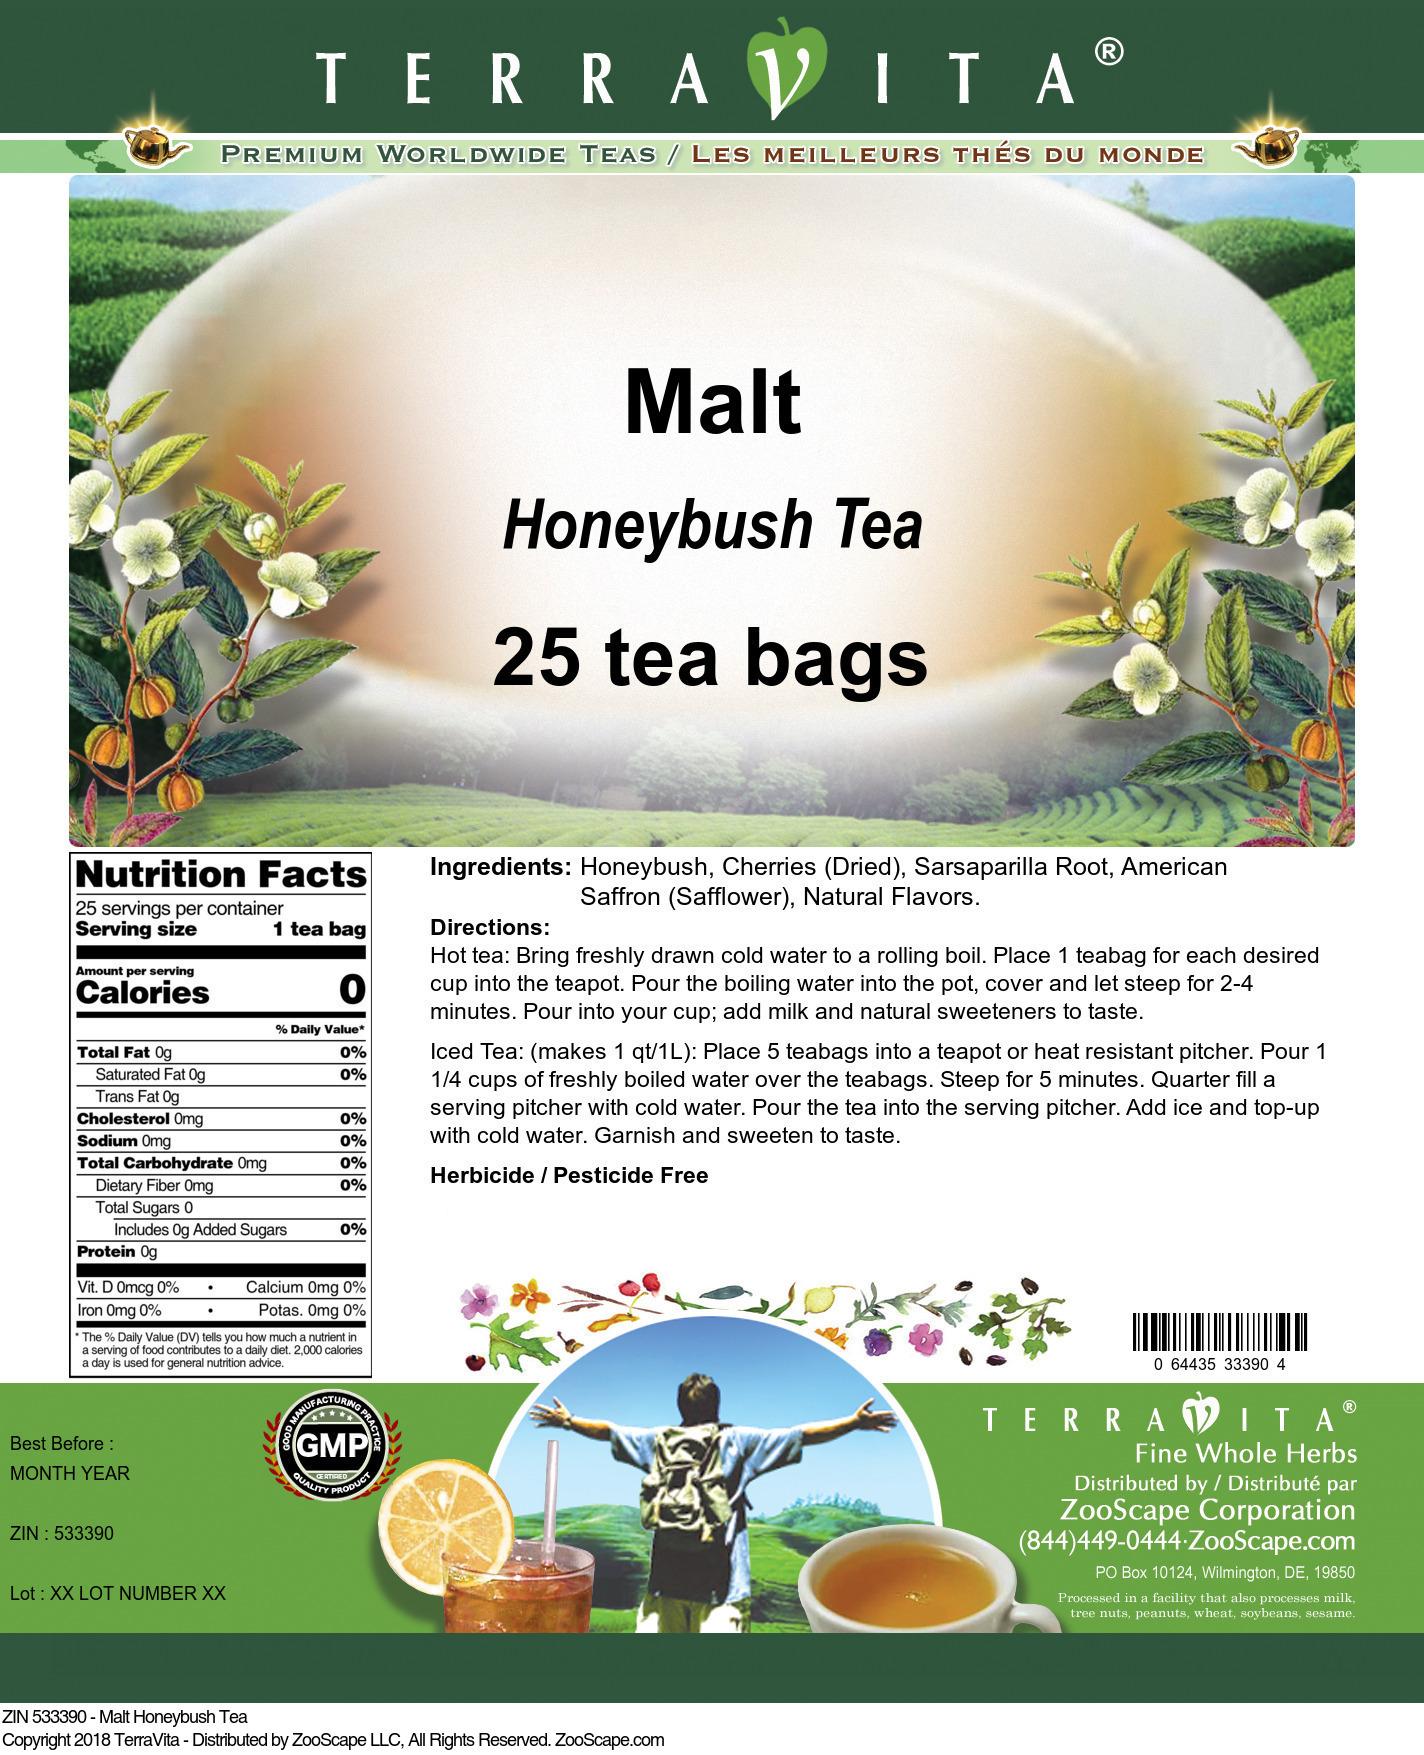 Malt Honeybush Tea